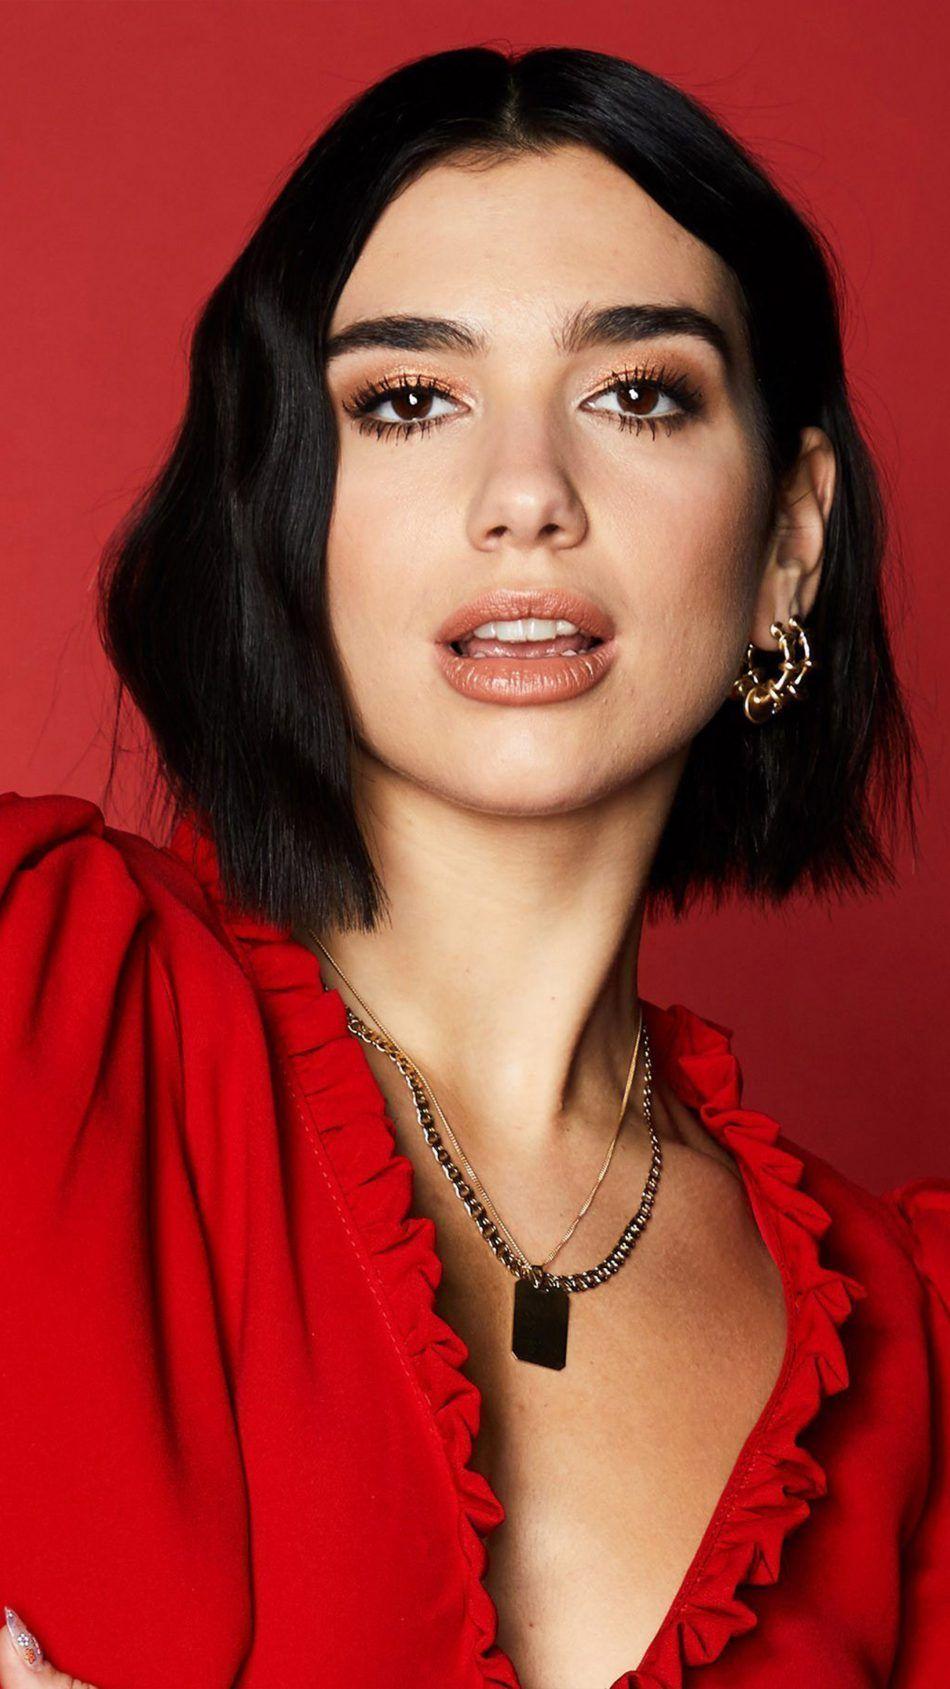 Dua Lipa In Red Dress 2019 4k Ultra Hd Mobile Wallpaper Dua Lipa Short Hair Styles